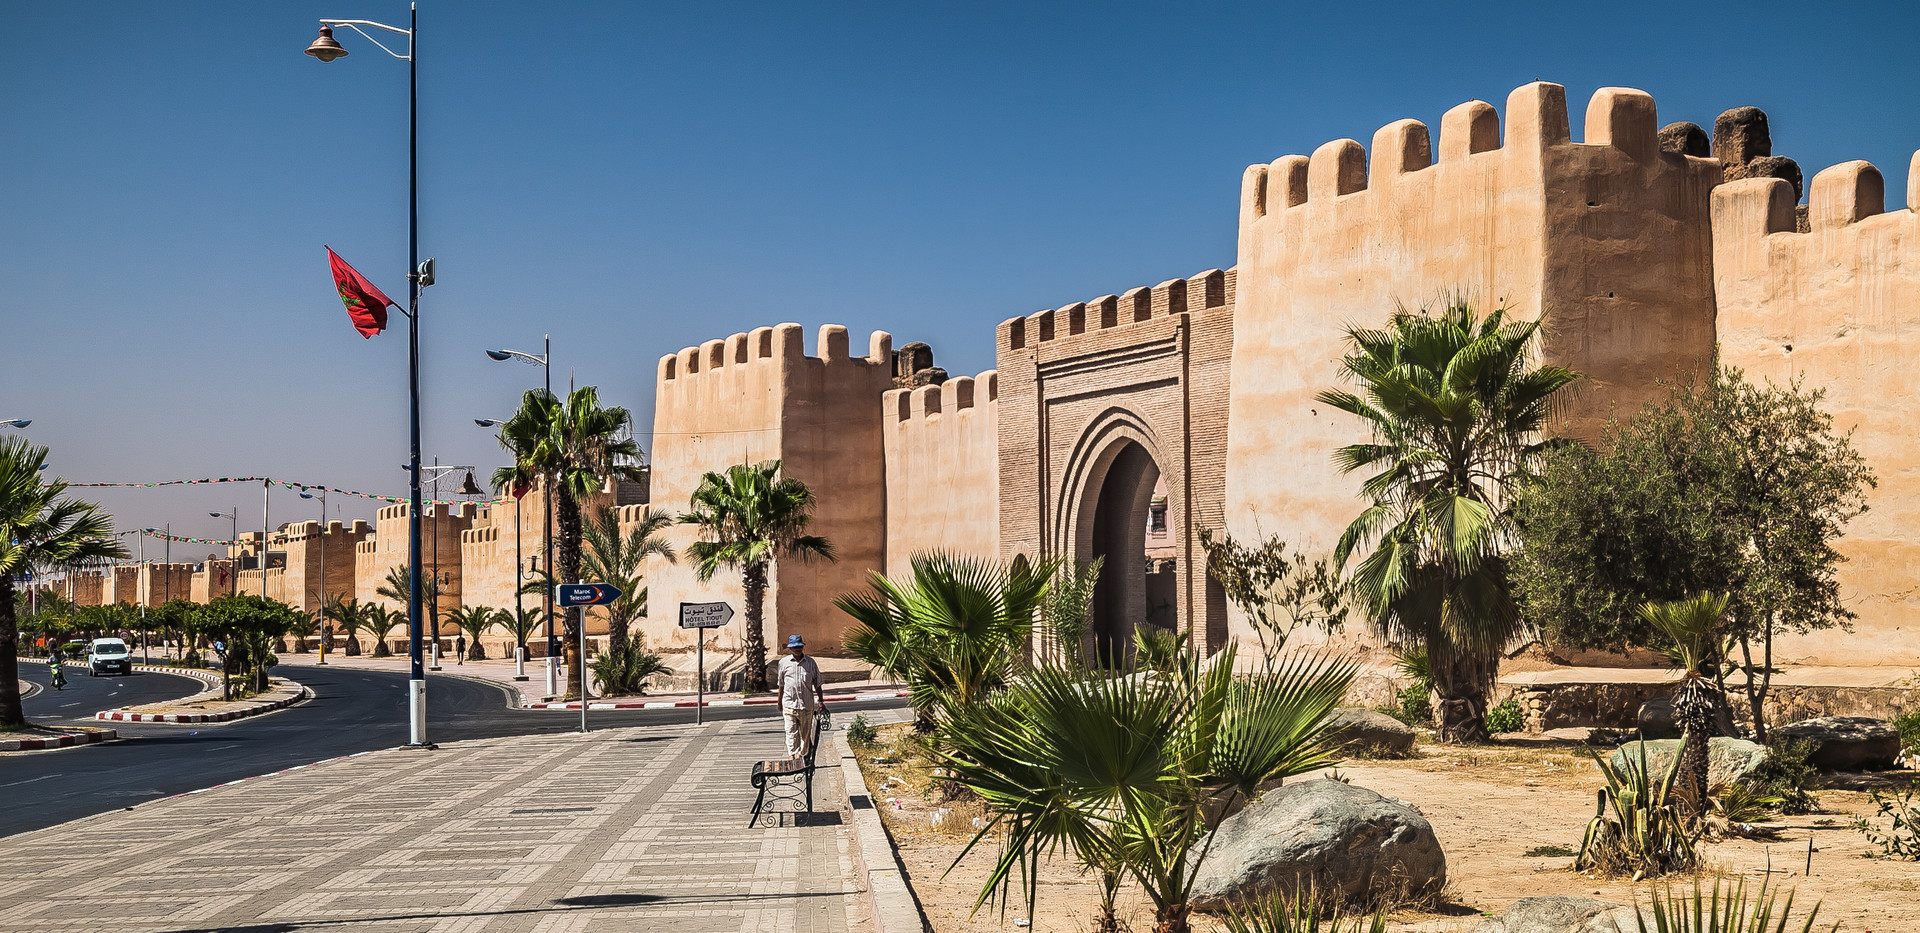 ancient city walls of taroudant, morocco